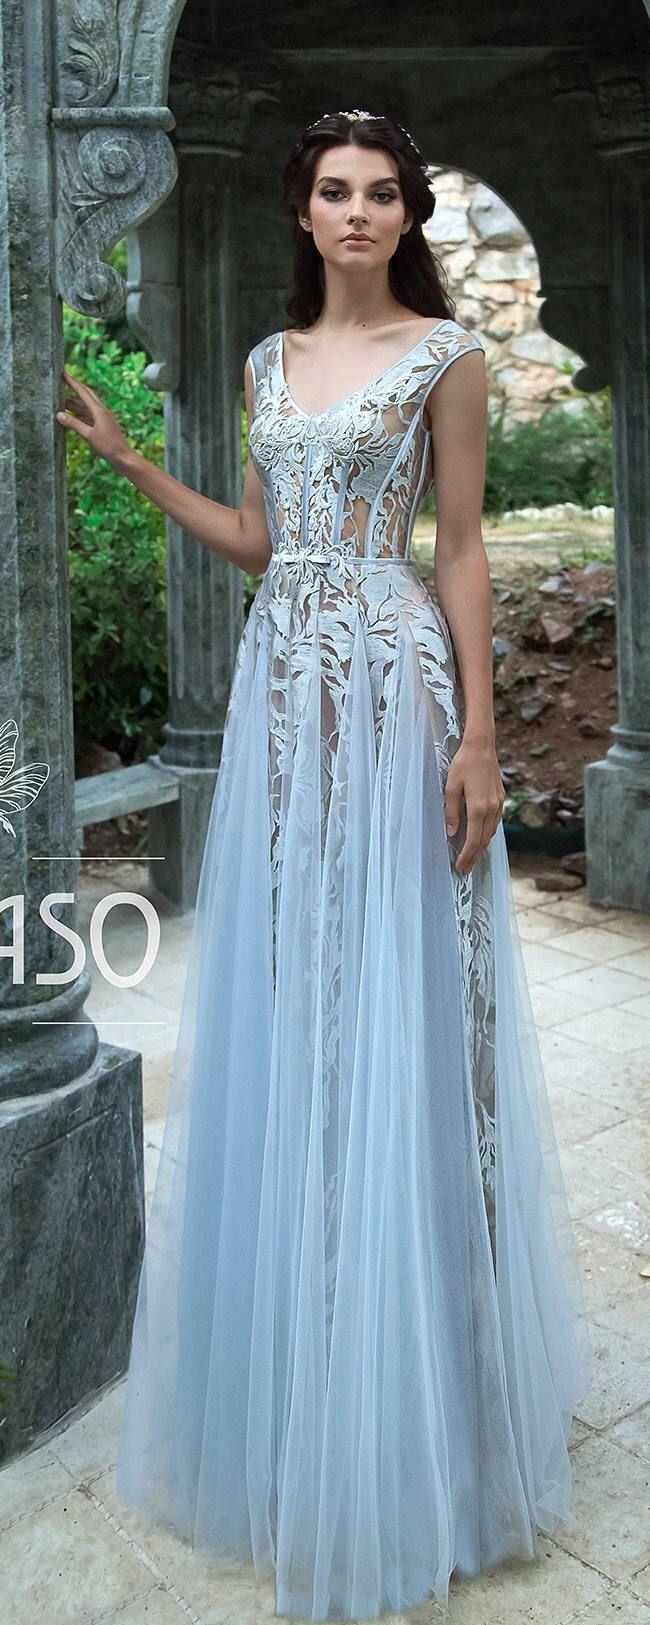 e237a706165 Bohemian A-Line Wedding Dresses Lace Short Cap Sleeve V-Neck Open Backless  Milky Light Blue Tea Rose Tulle Beach Rustic Bridal Gown AQUA